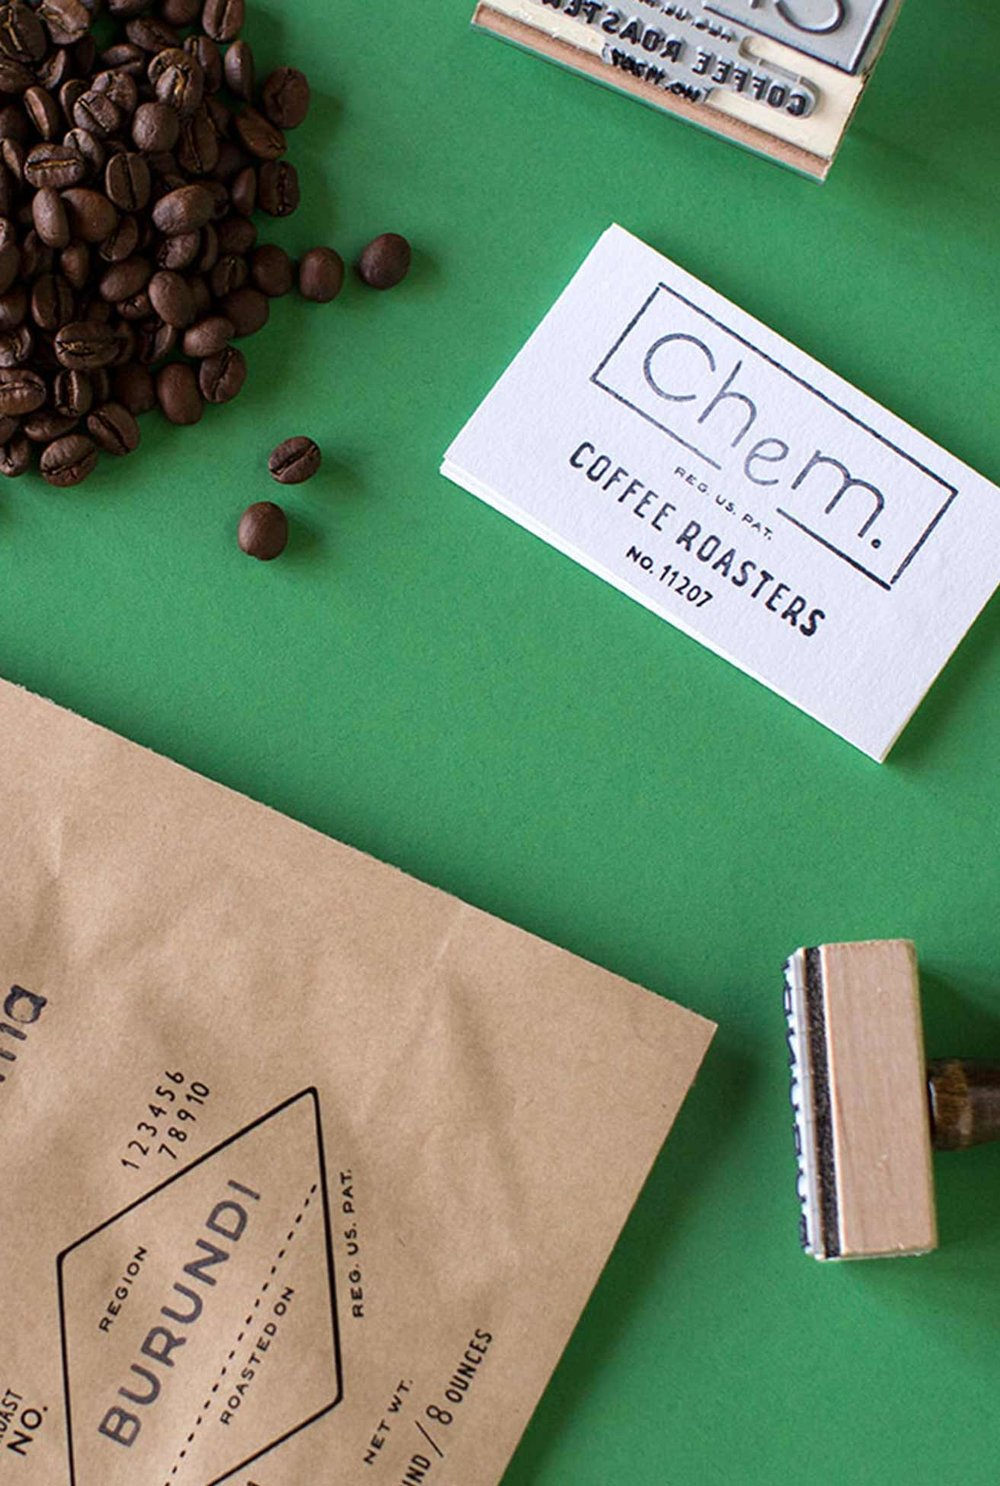 chemcoffee-vert_bag-stamp.jpg